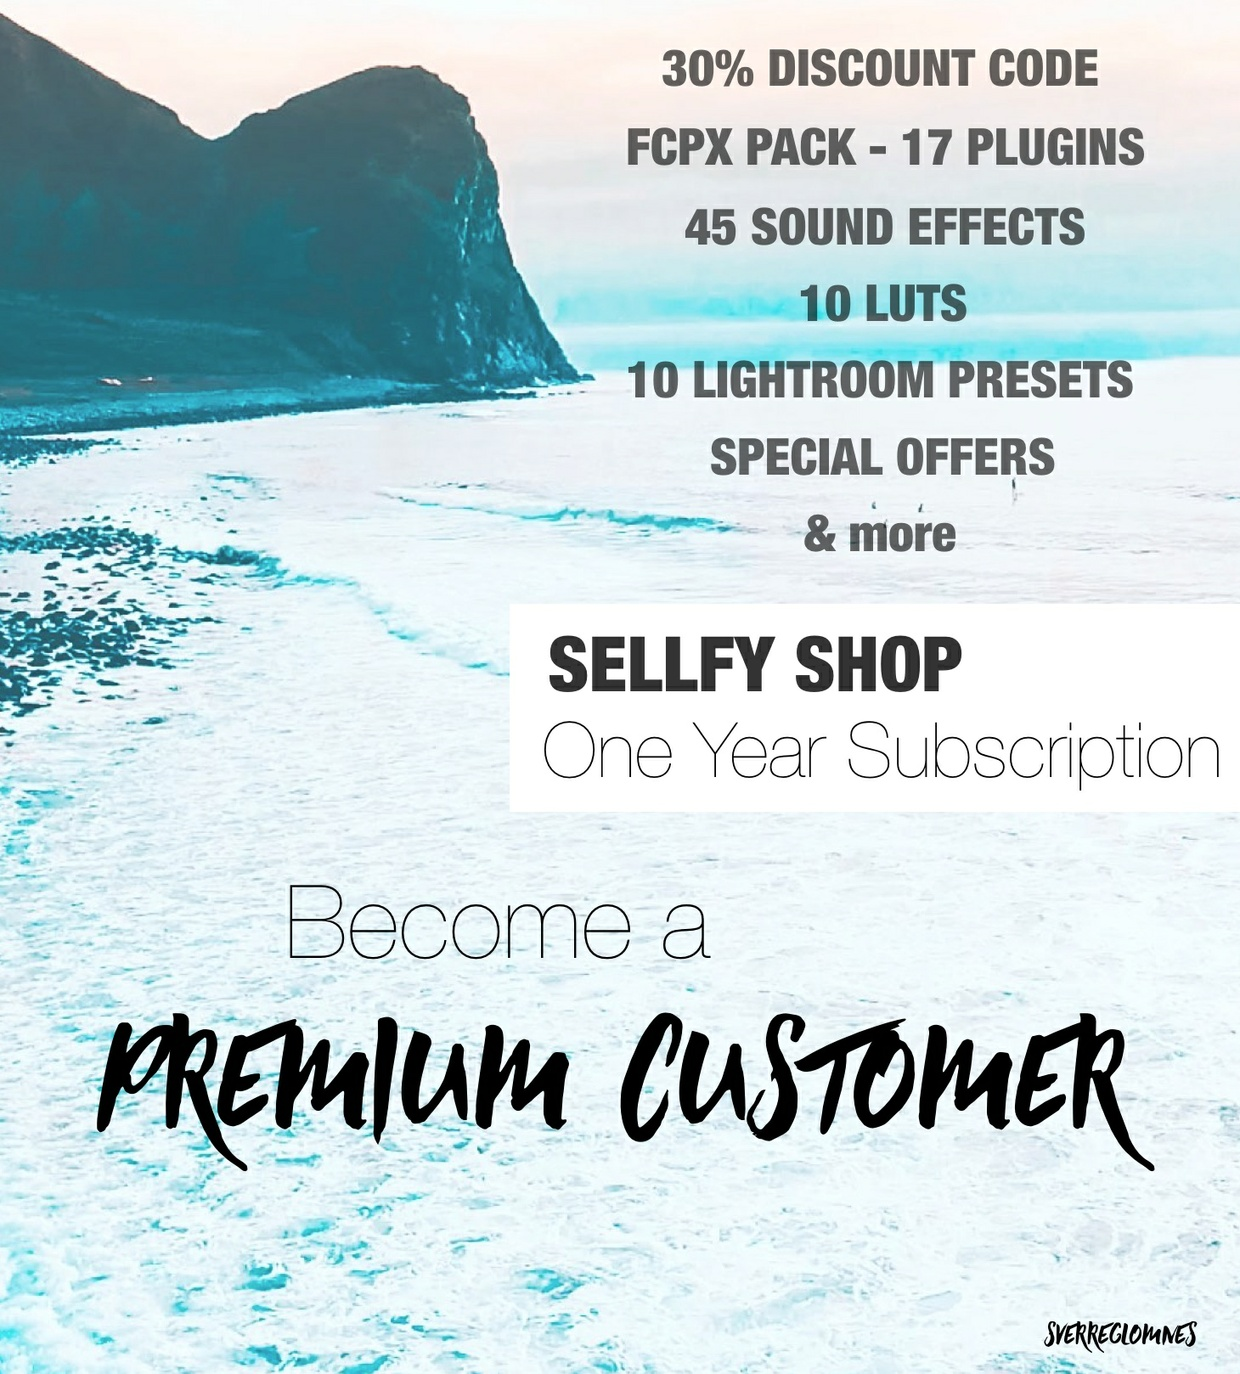 PREMIUM CUSTOMER - One Year Subscription // SverreGlomnes Sellfy Shop